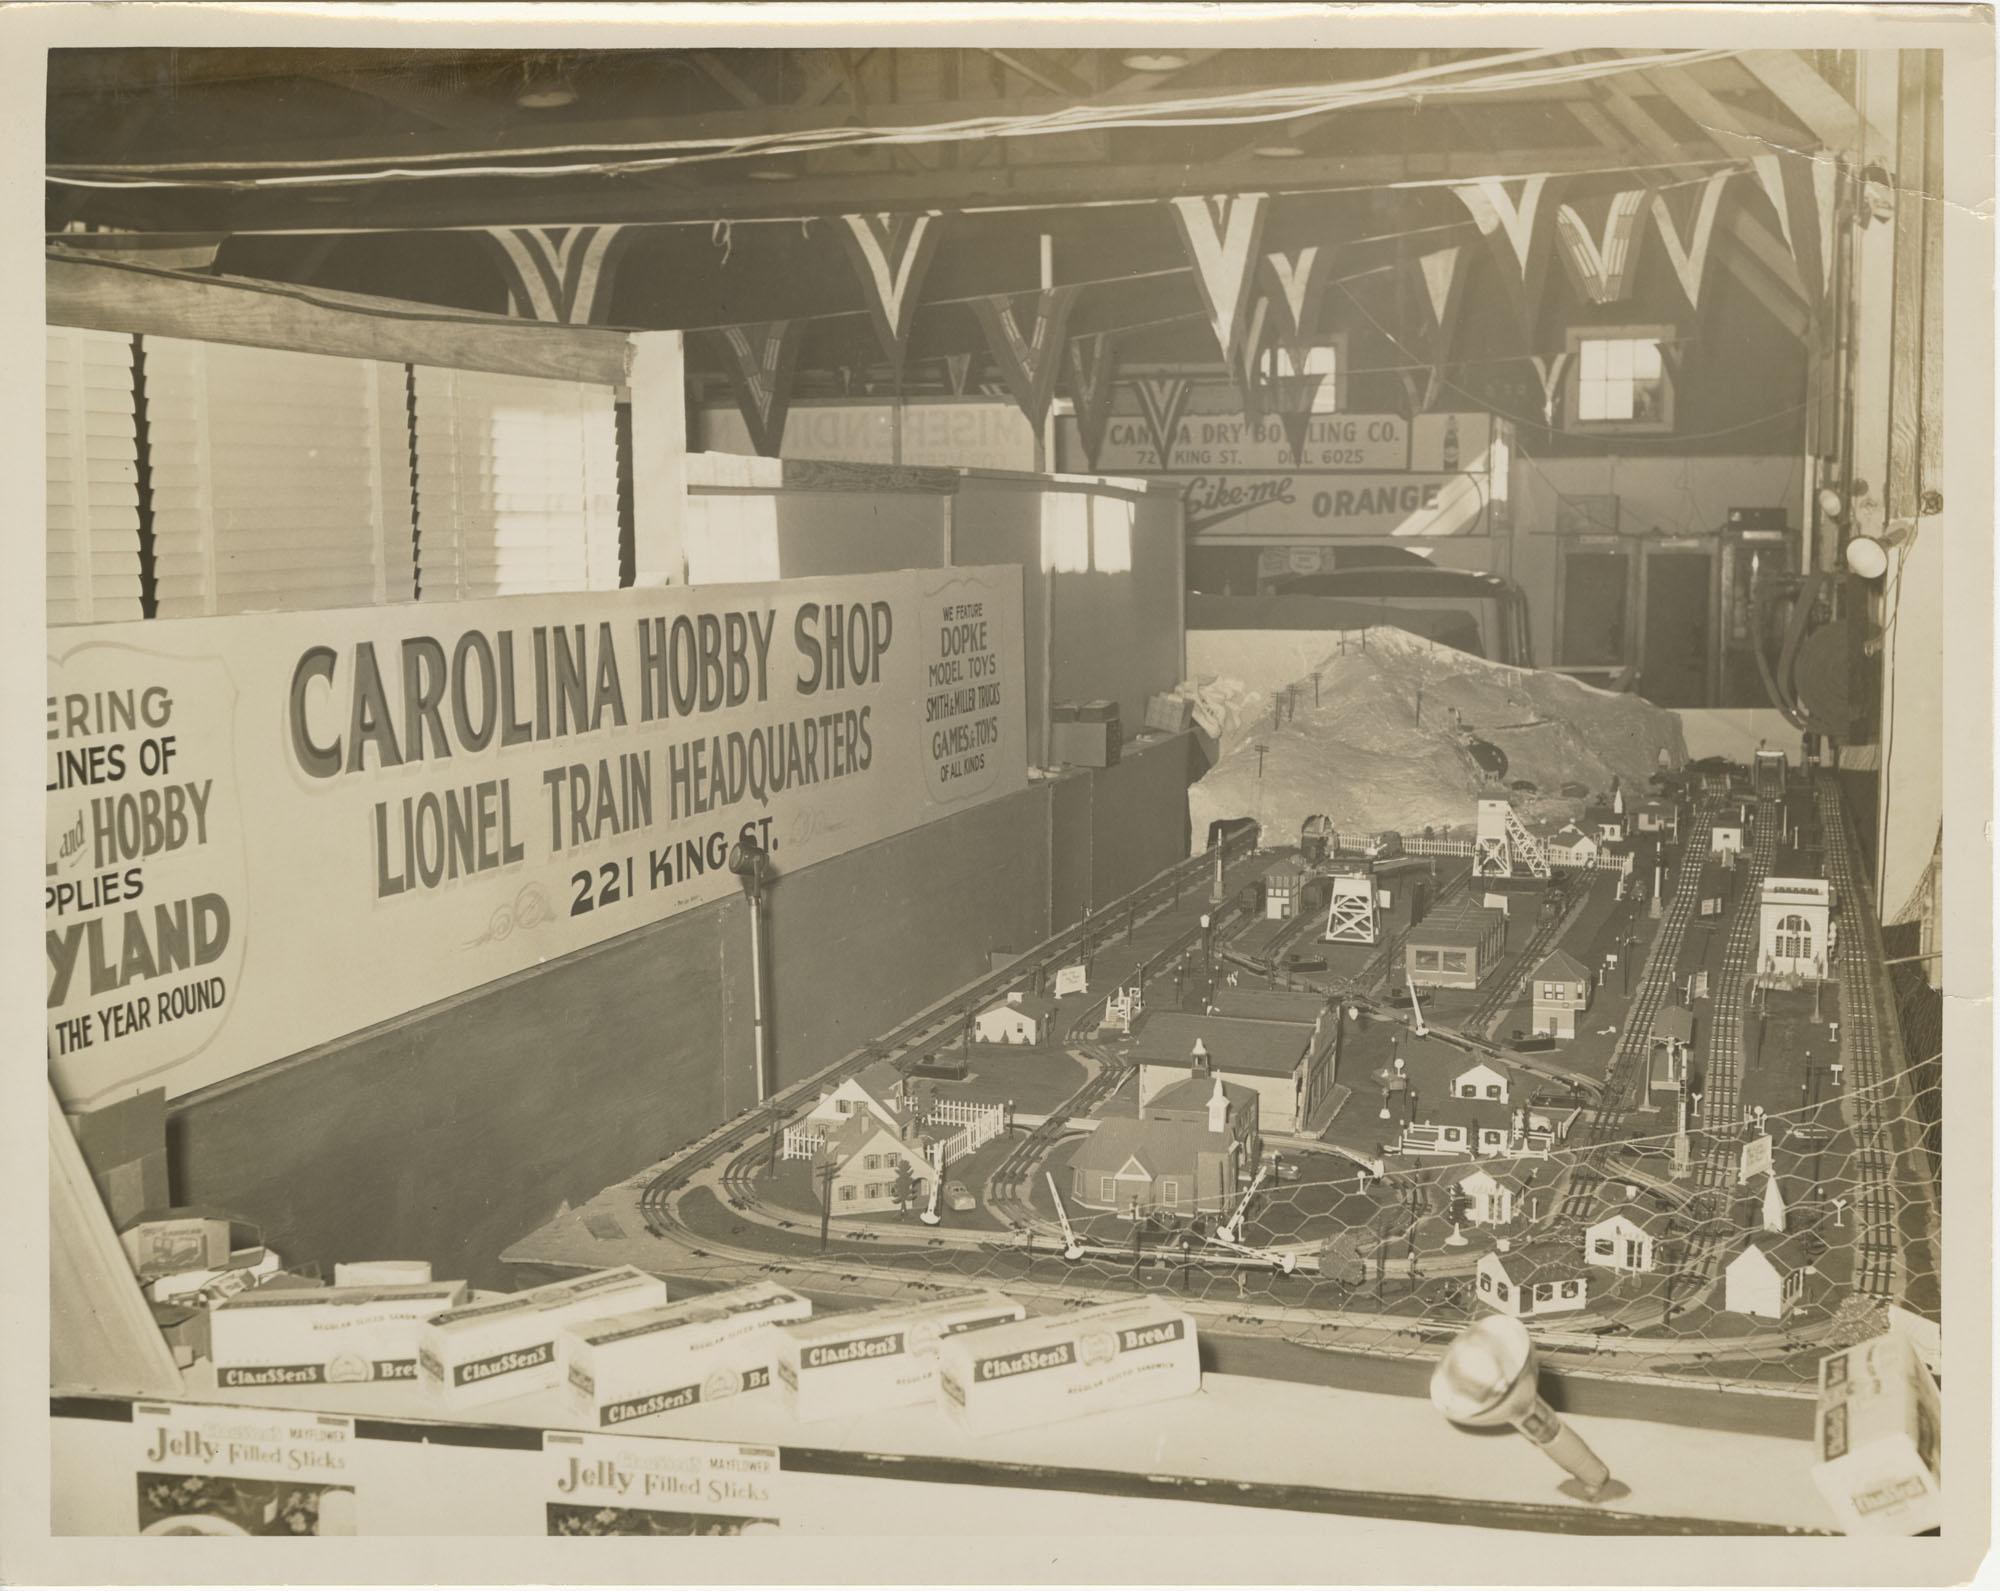 Carolina Hobby Shop Fair Exhibit